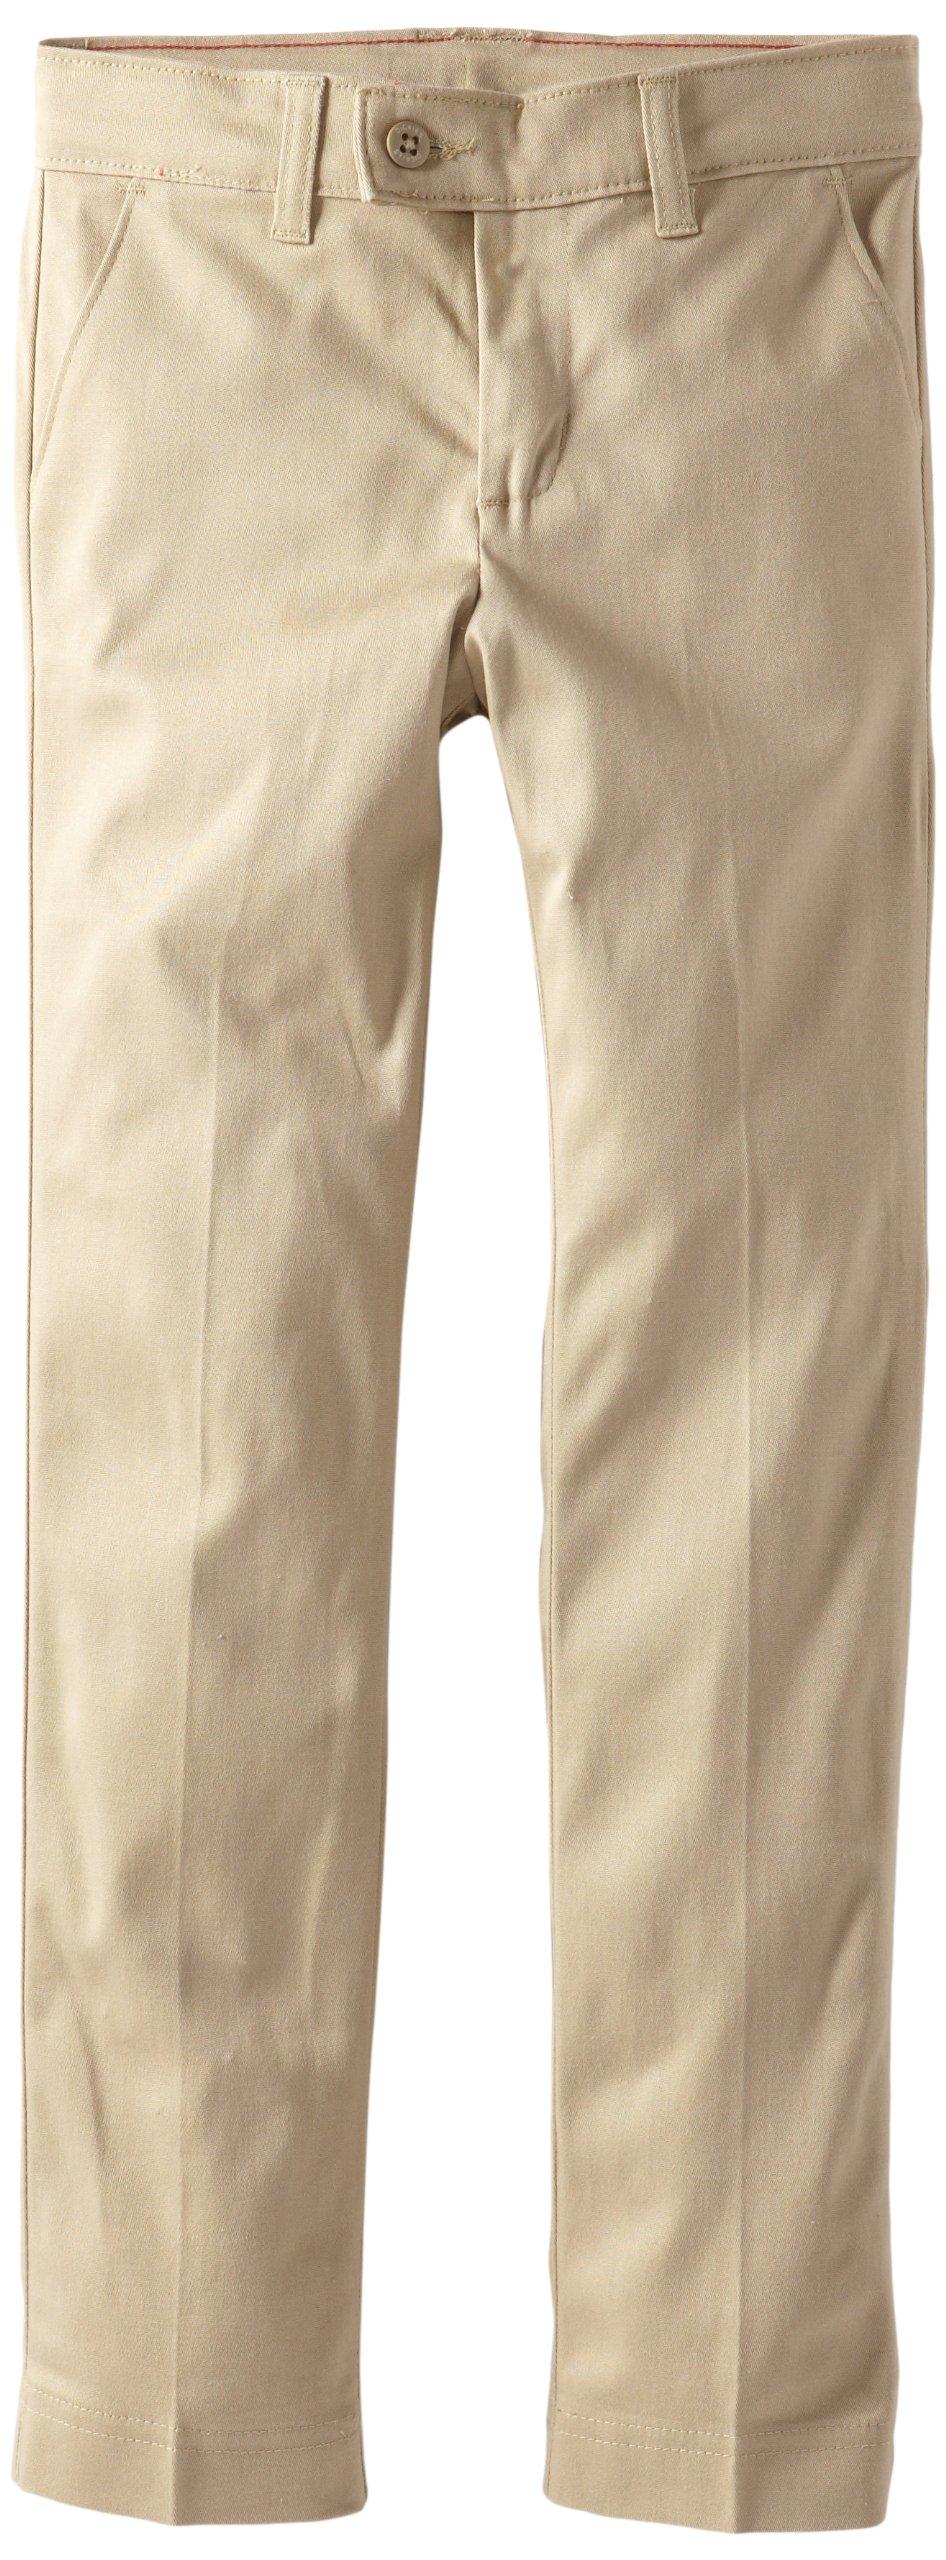 Dickies Big Girls' Stretch Slim Straight Pant, Desert Sand, 18 by Dickies